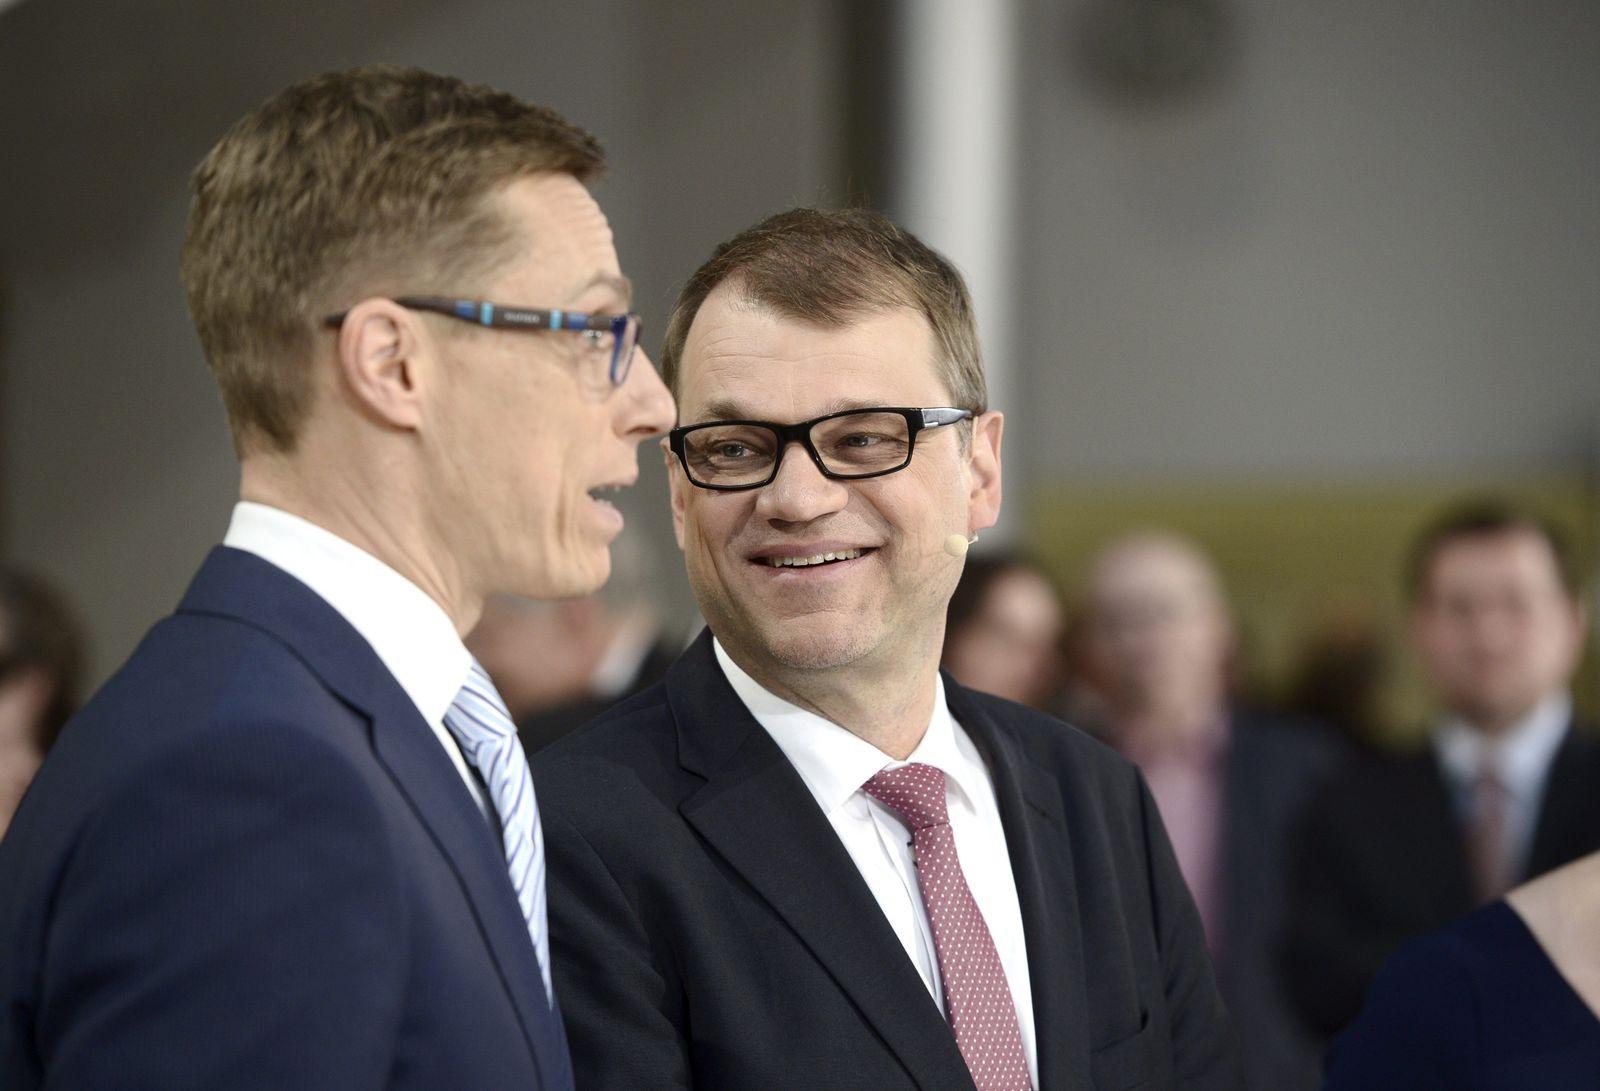 Finnland, Parlamentswahl, Juha Sipilä, Alexander Stubbe